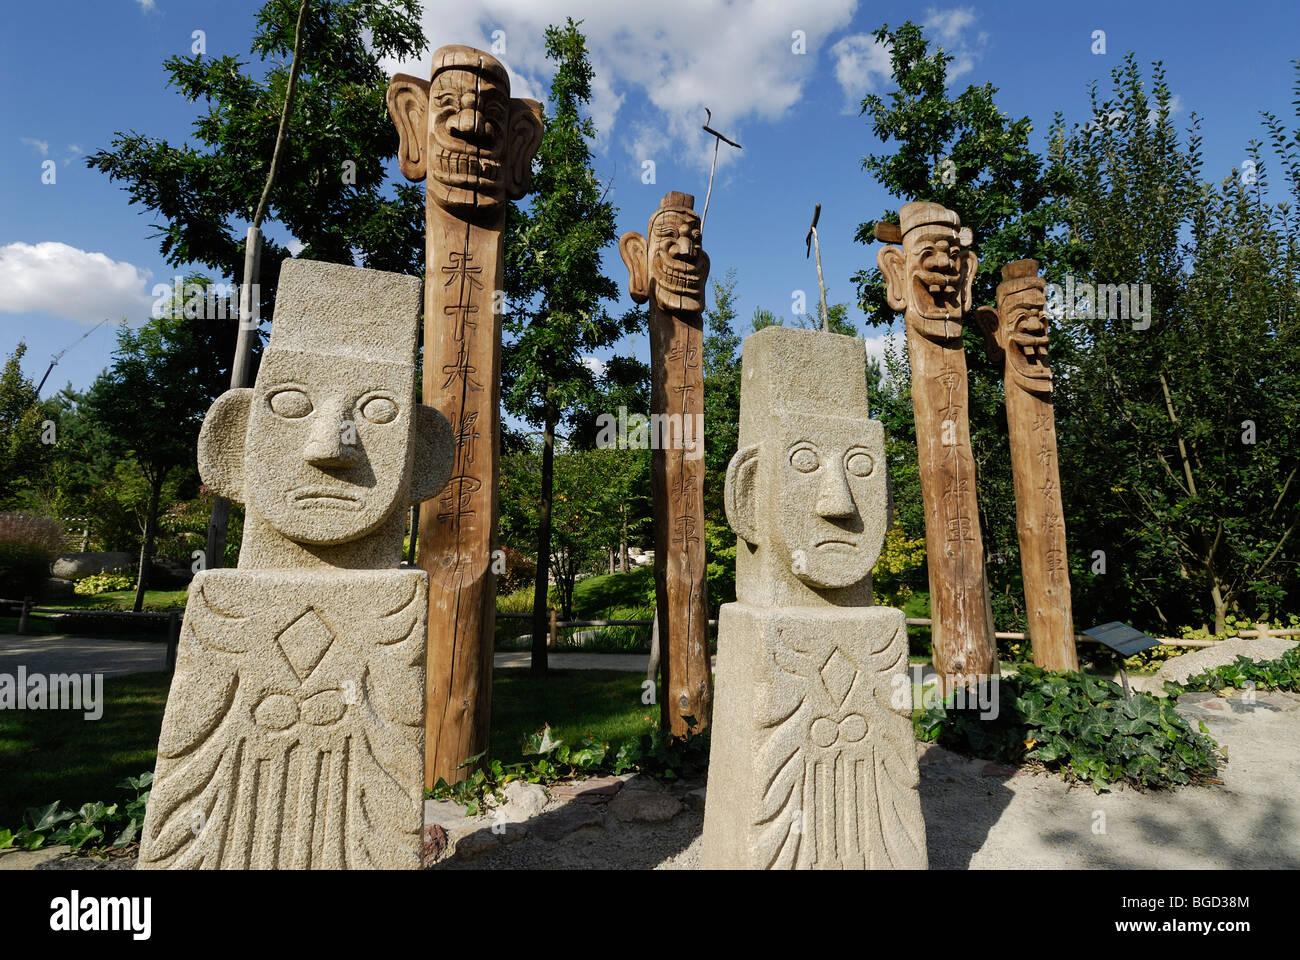 Berlin. Germany. Korean Pavilion at the Gardens of the World (Garten der Welt) Recreation Park in Marzahn. - Stock Image